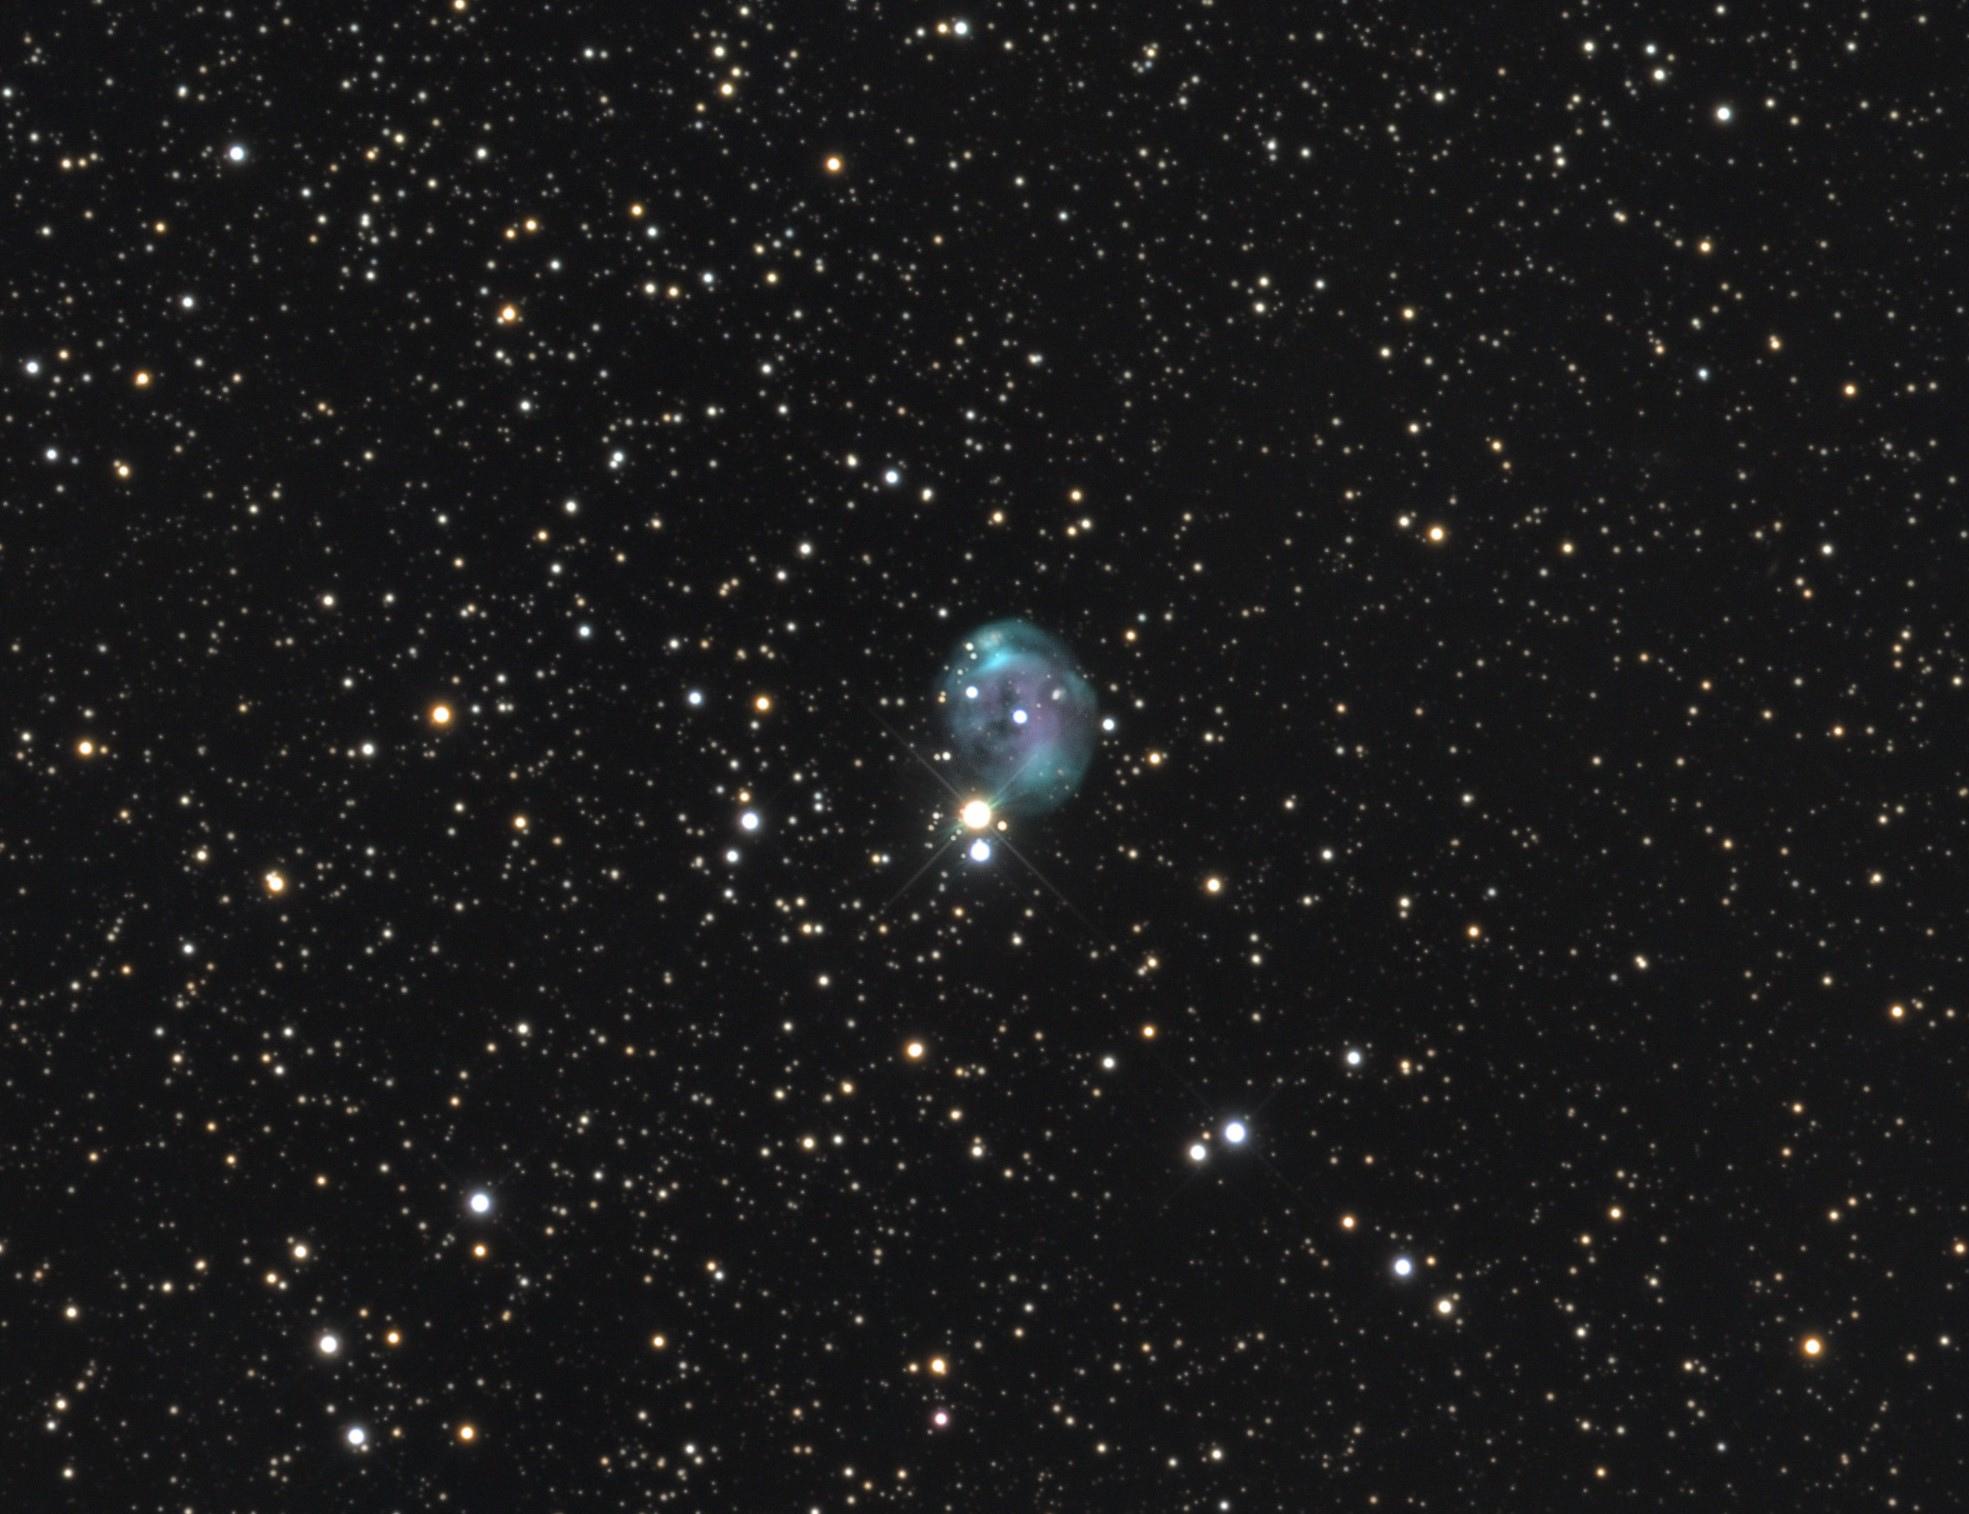 NGC7008-LRVB-V3-publi-Crop.jpg.1ca94b686390db0ee825830e5f4f9502.jpg